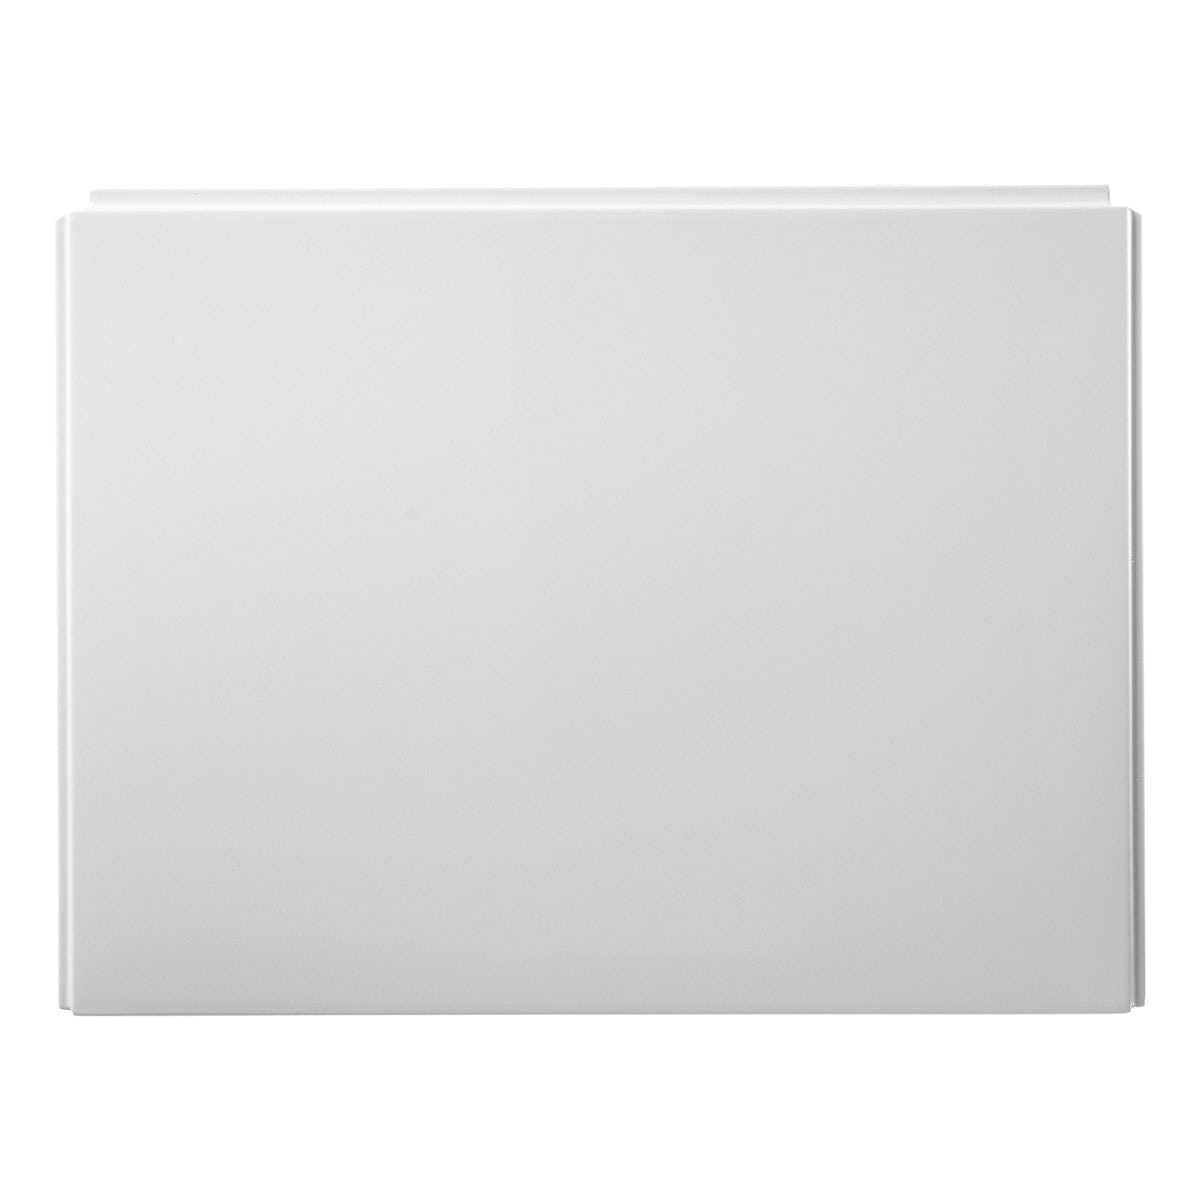 Ideal Standard Unilux Plus+ acrylic end bath panel 700mm